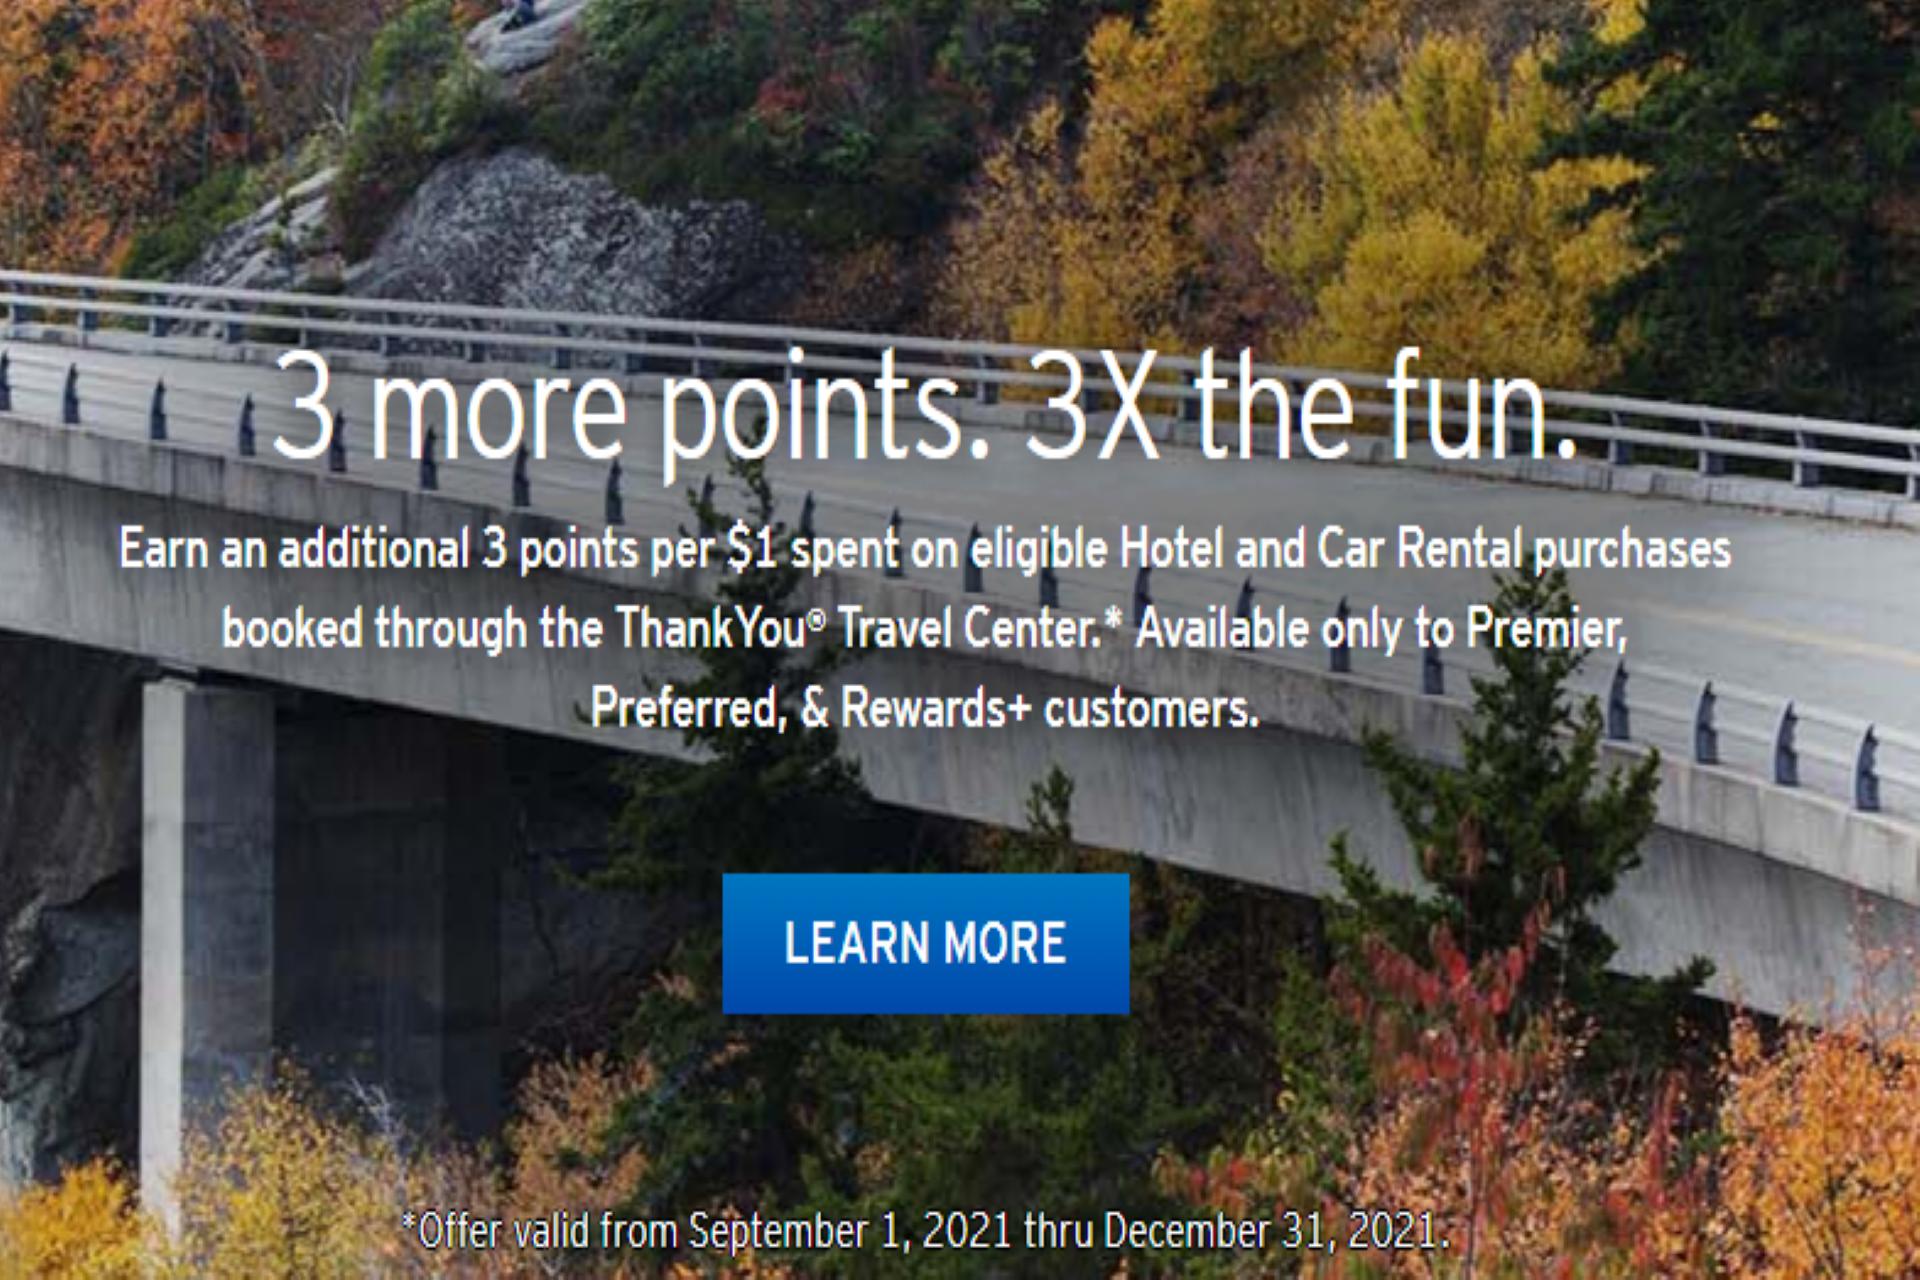 citi thankyou rewards 3X points travel